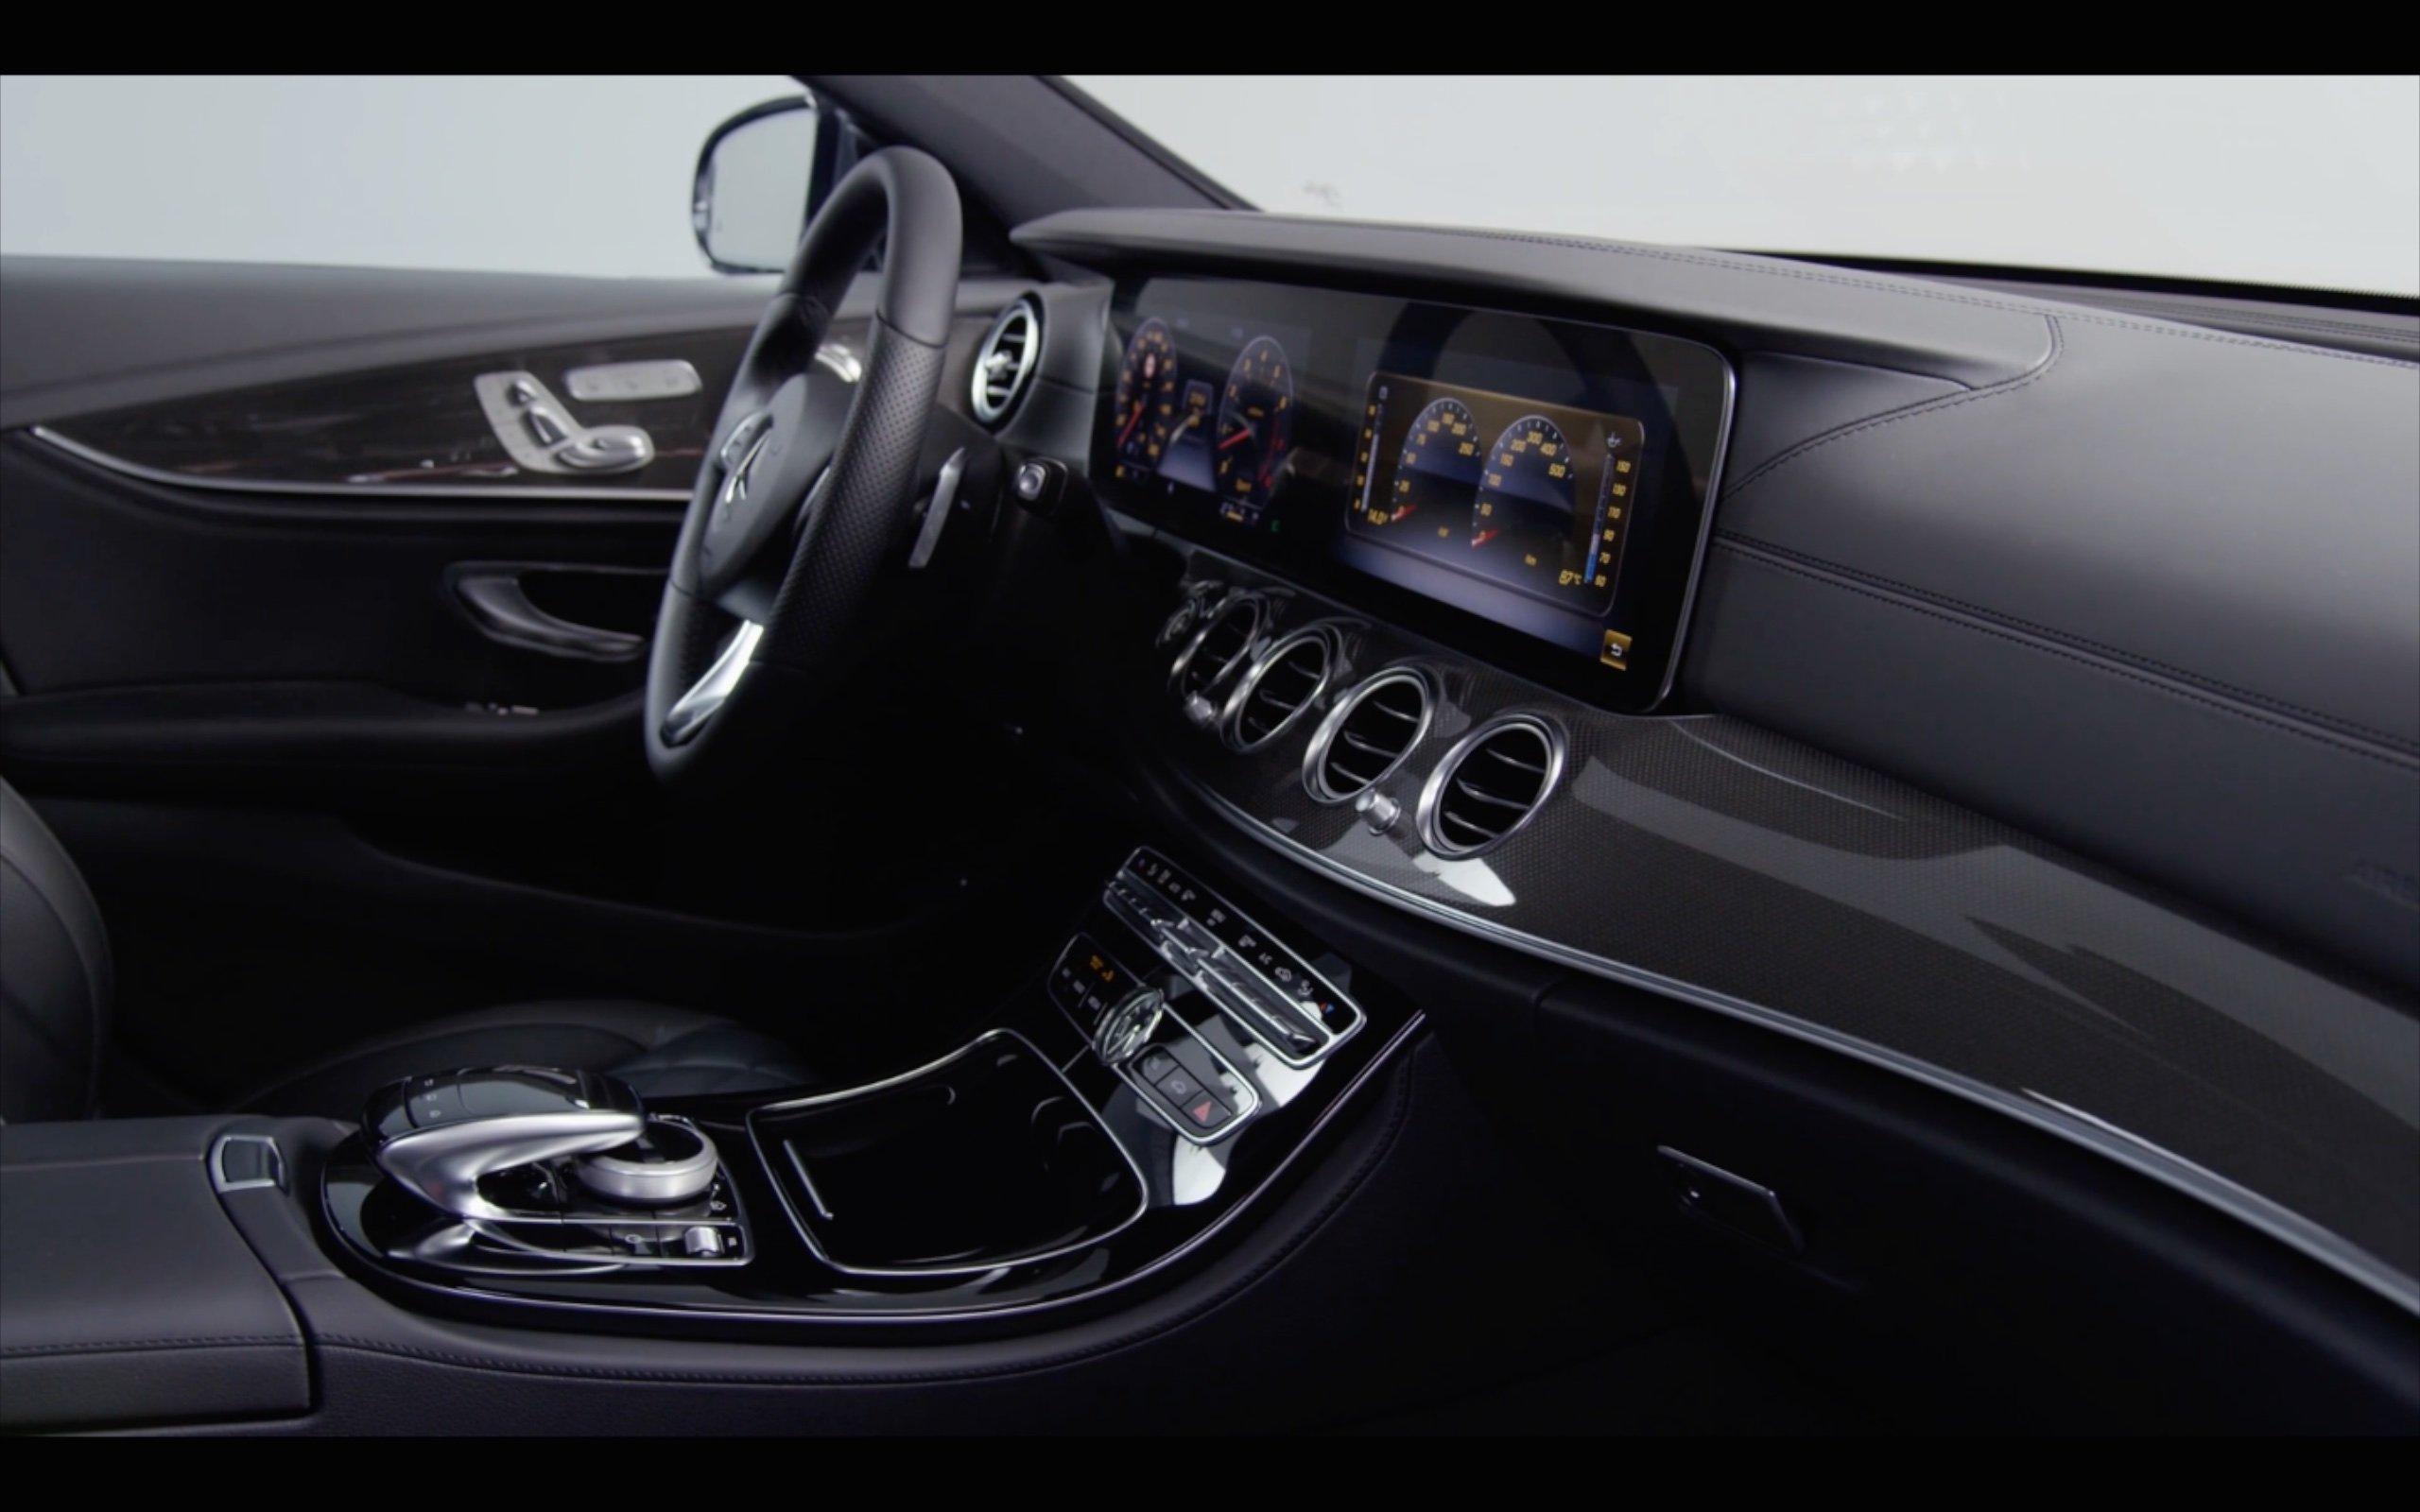 VIDEO: W213 Mercedes-Benz E-Class interior detailed Image 418693